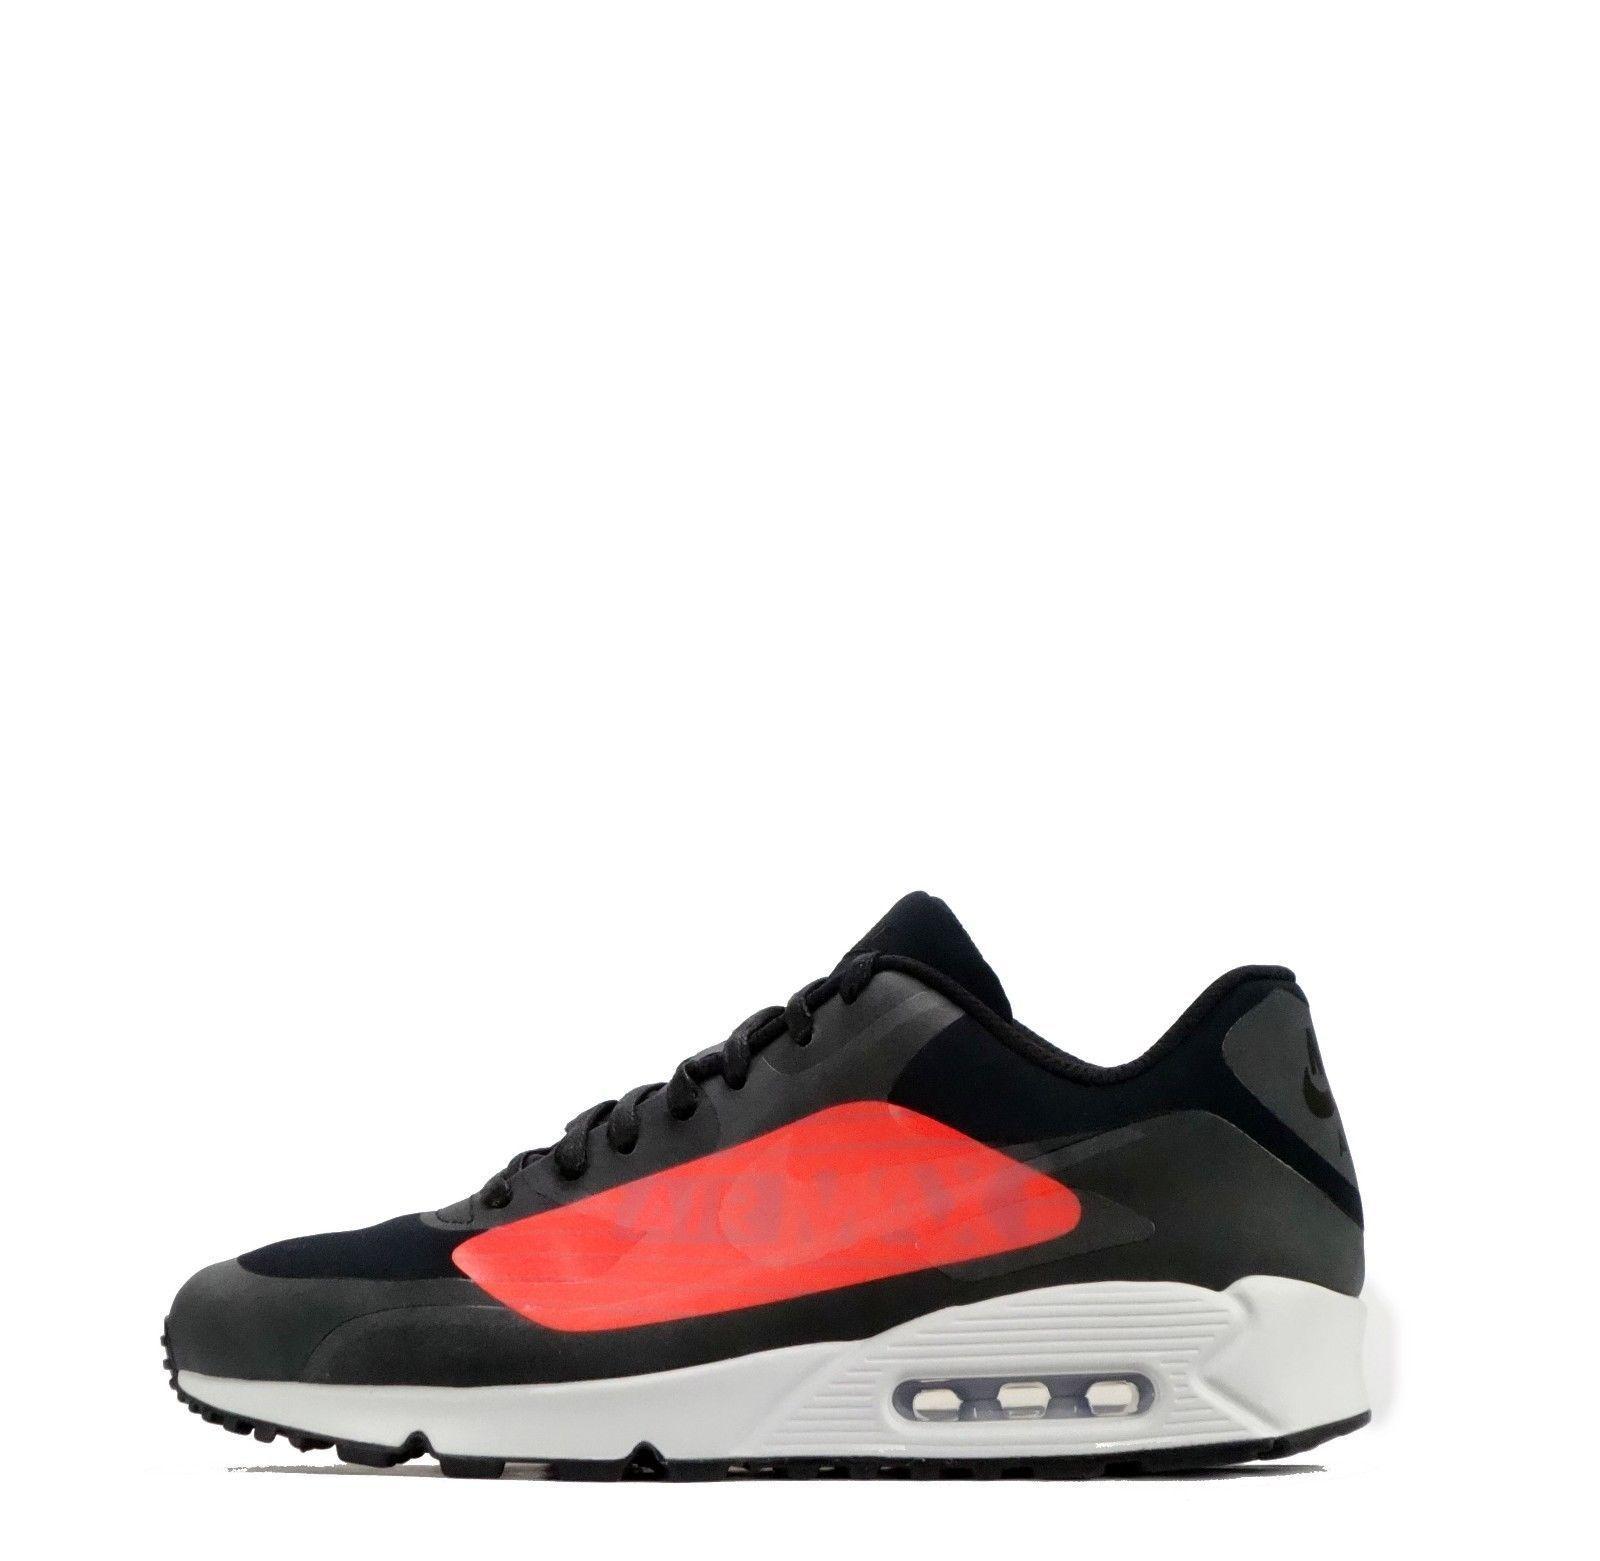 Nike AIR MAX 90 Big Logo Uomo Scarpe da ginnastica (/EU 45.5/US 11.5) Nero Nuovo di Zecca